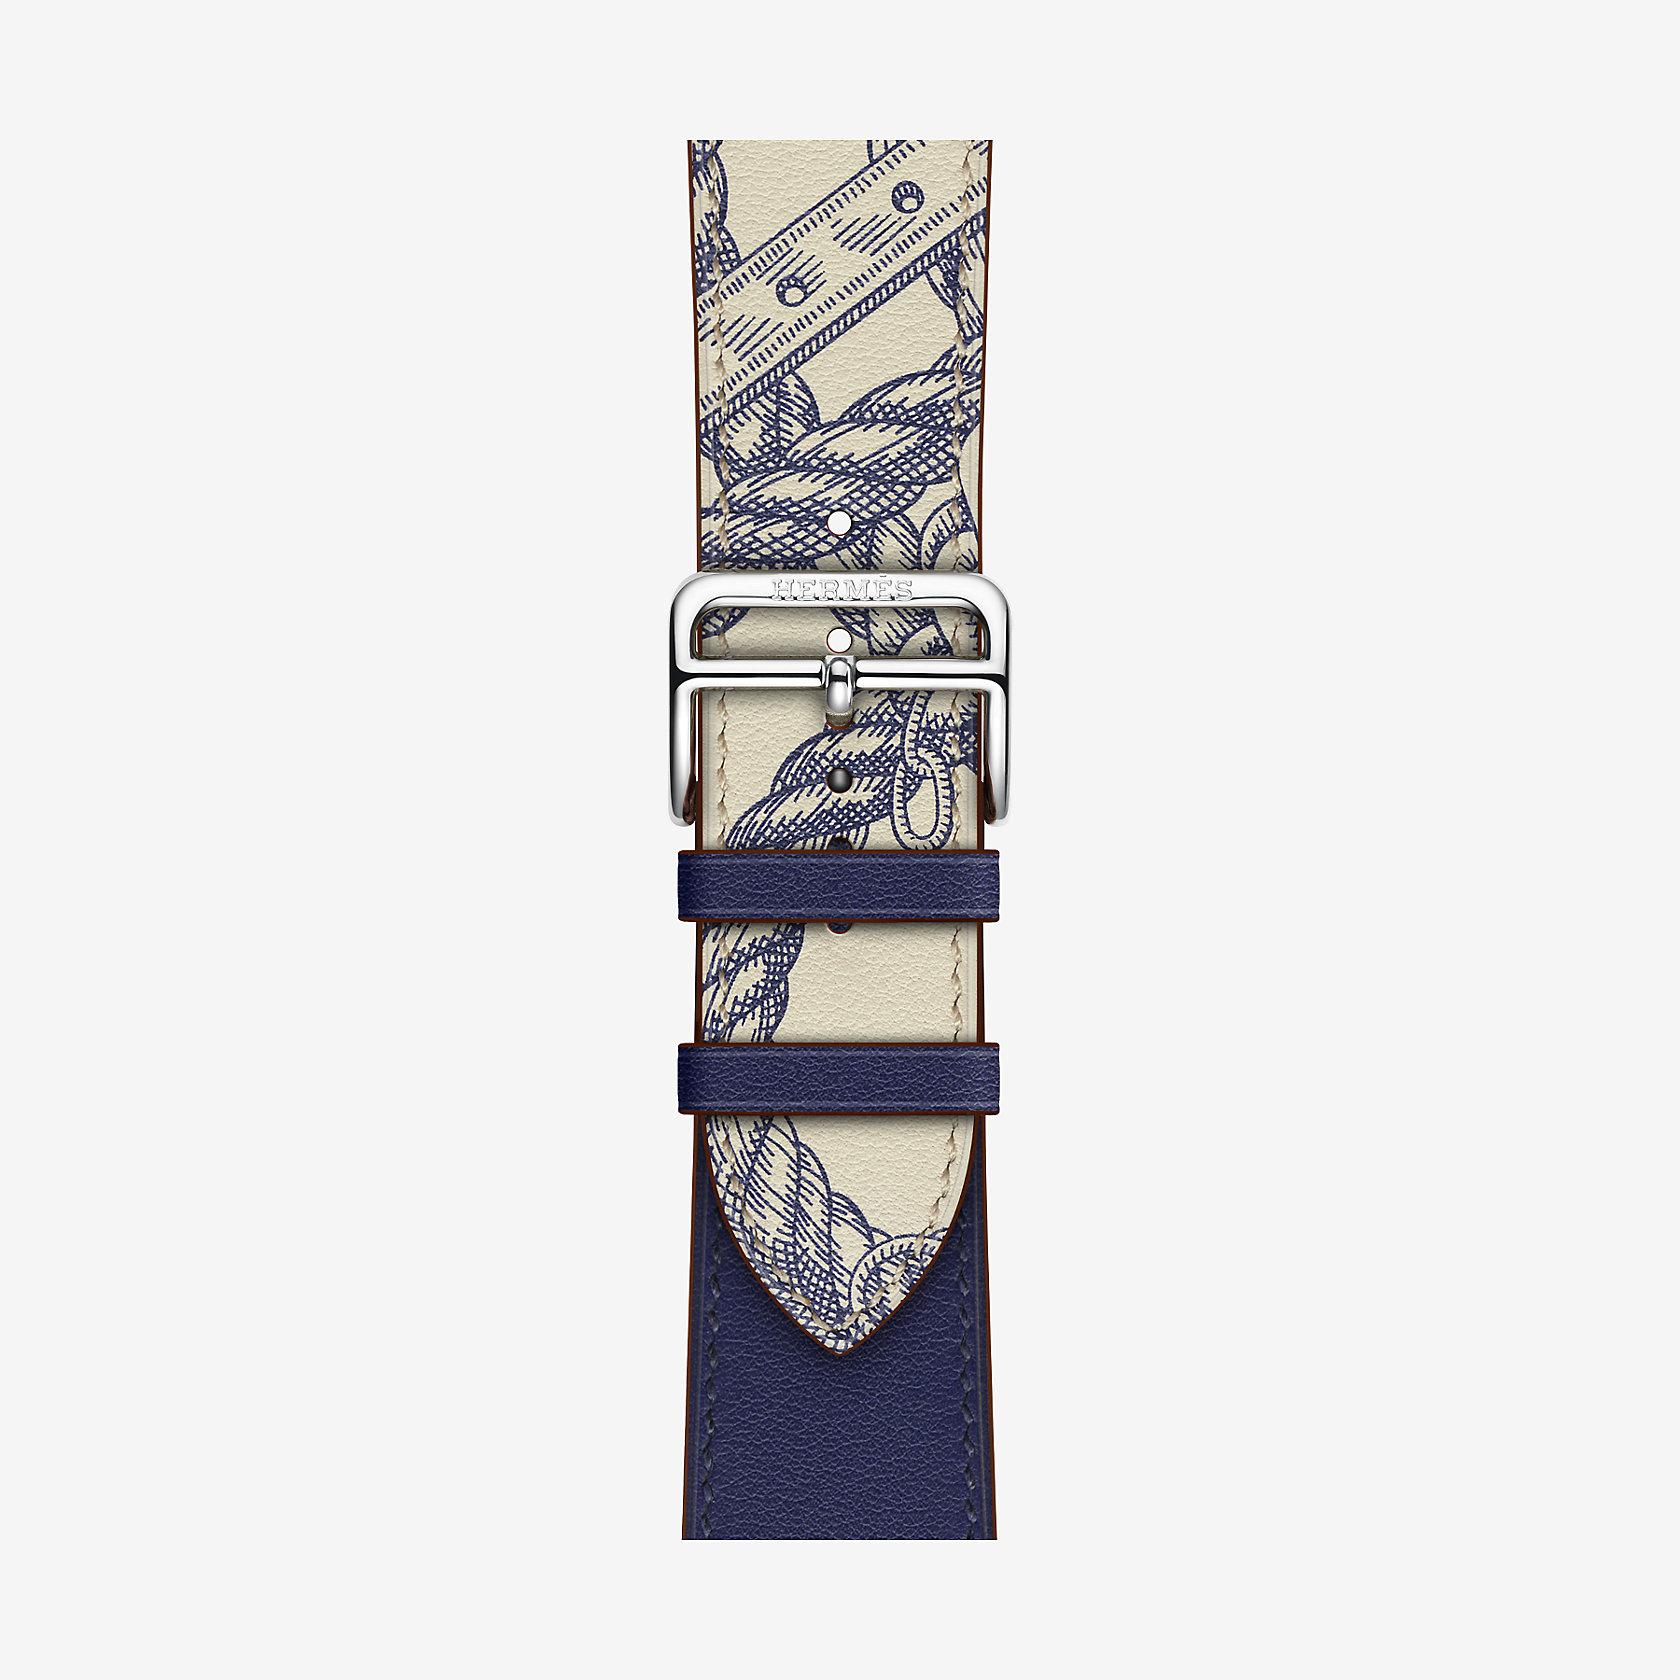 Bracelet Apple Watch Hermès Single Tour 44 mm